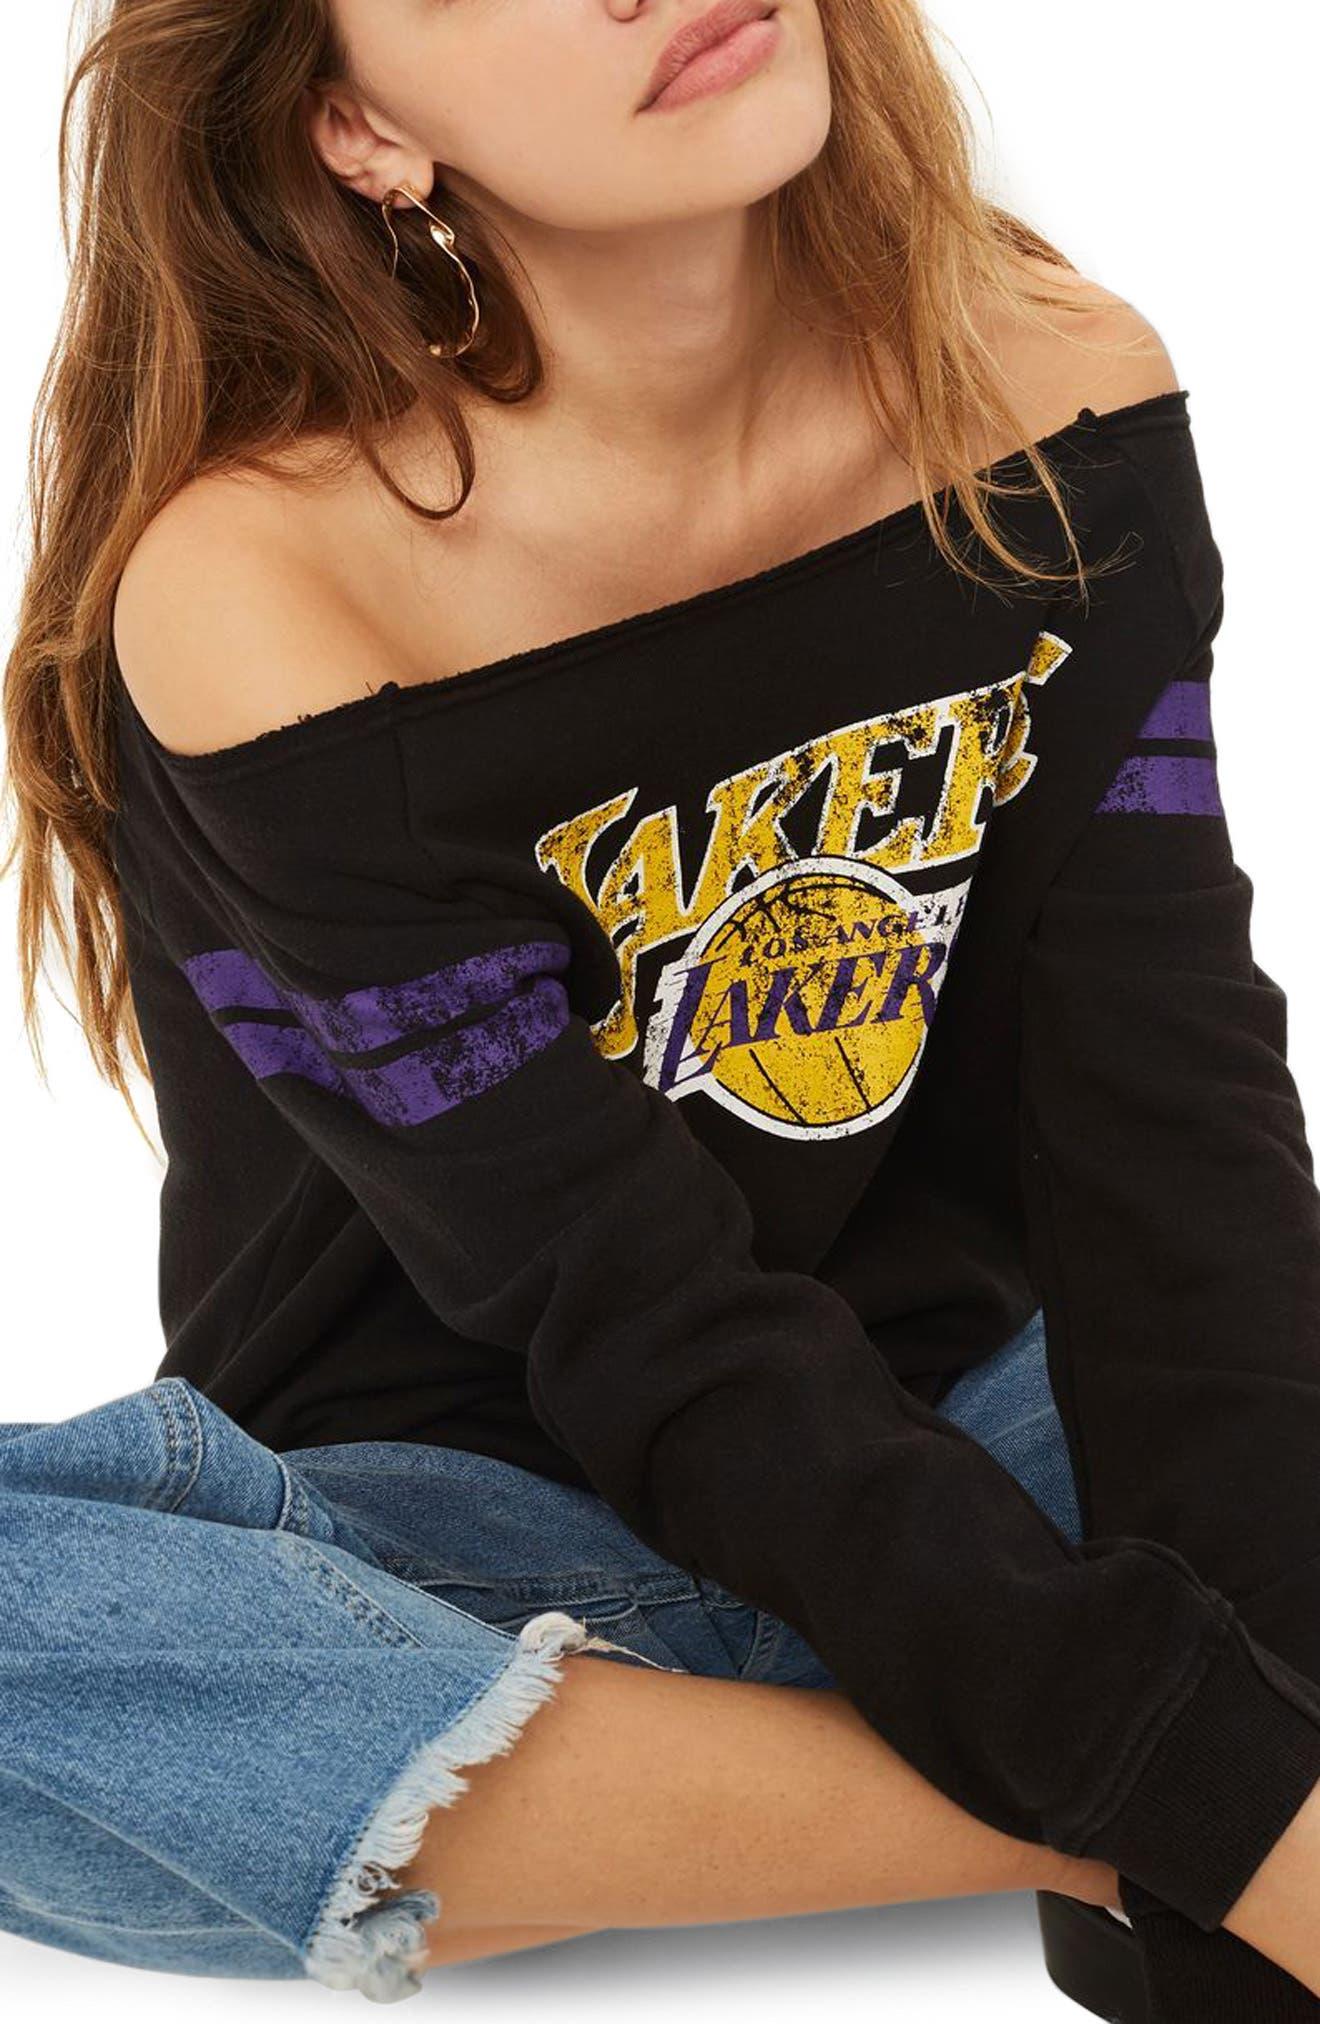 x UNK Lakers Convertible Sweatshirt,                             Main thumbnail 1, color,                             Black Multi